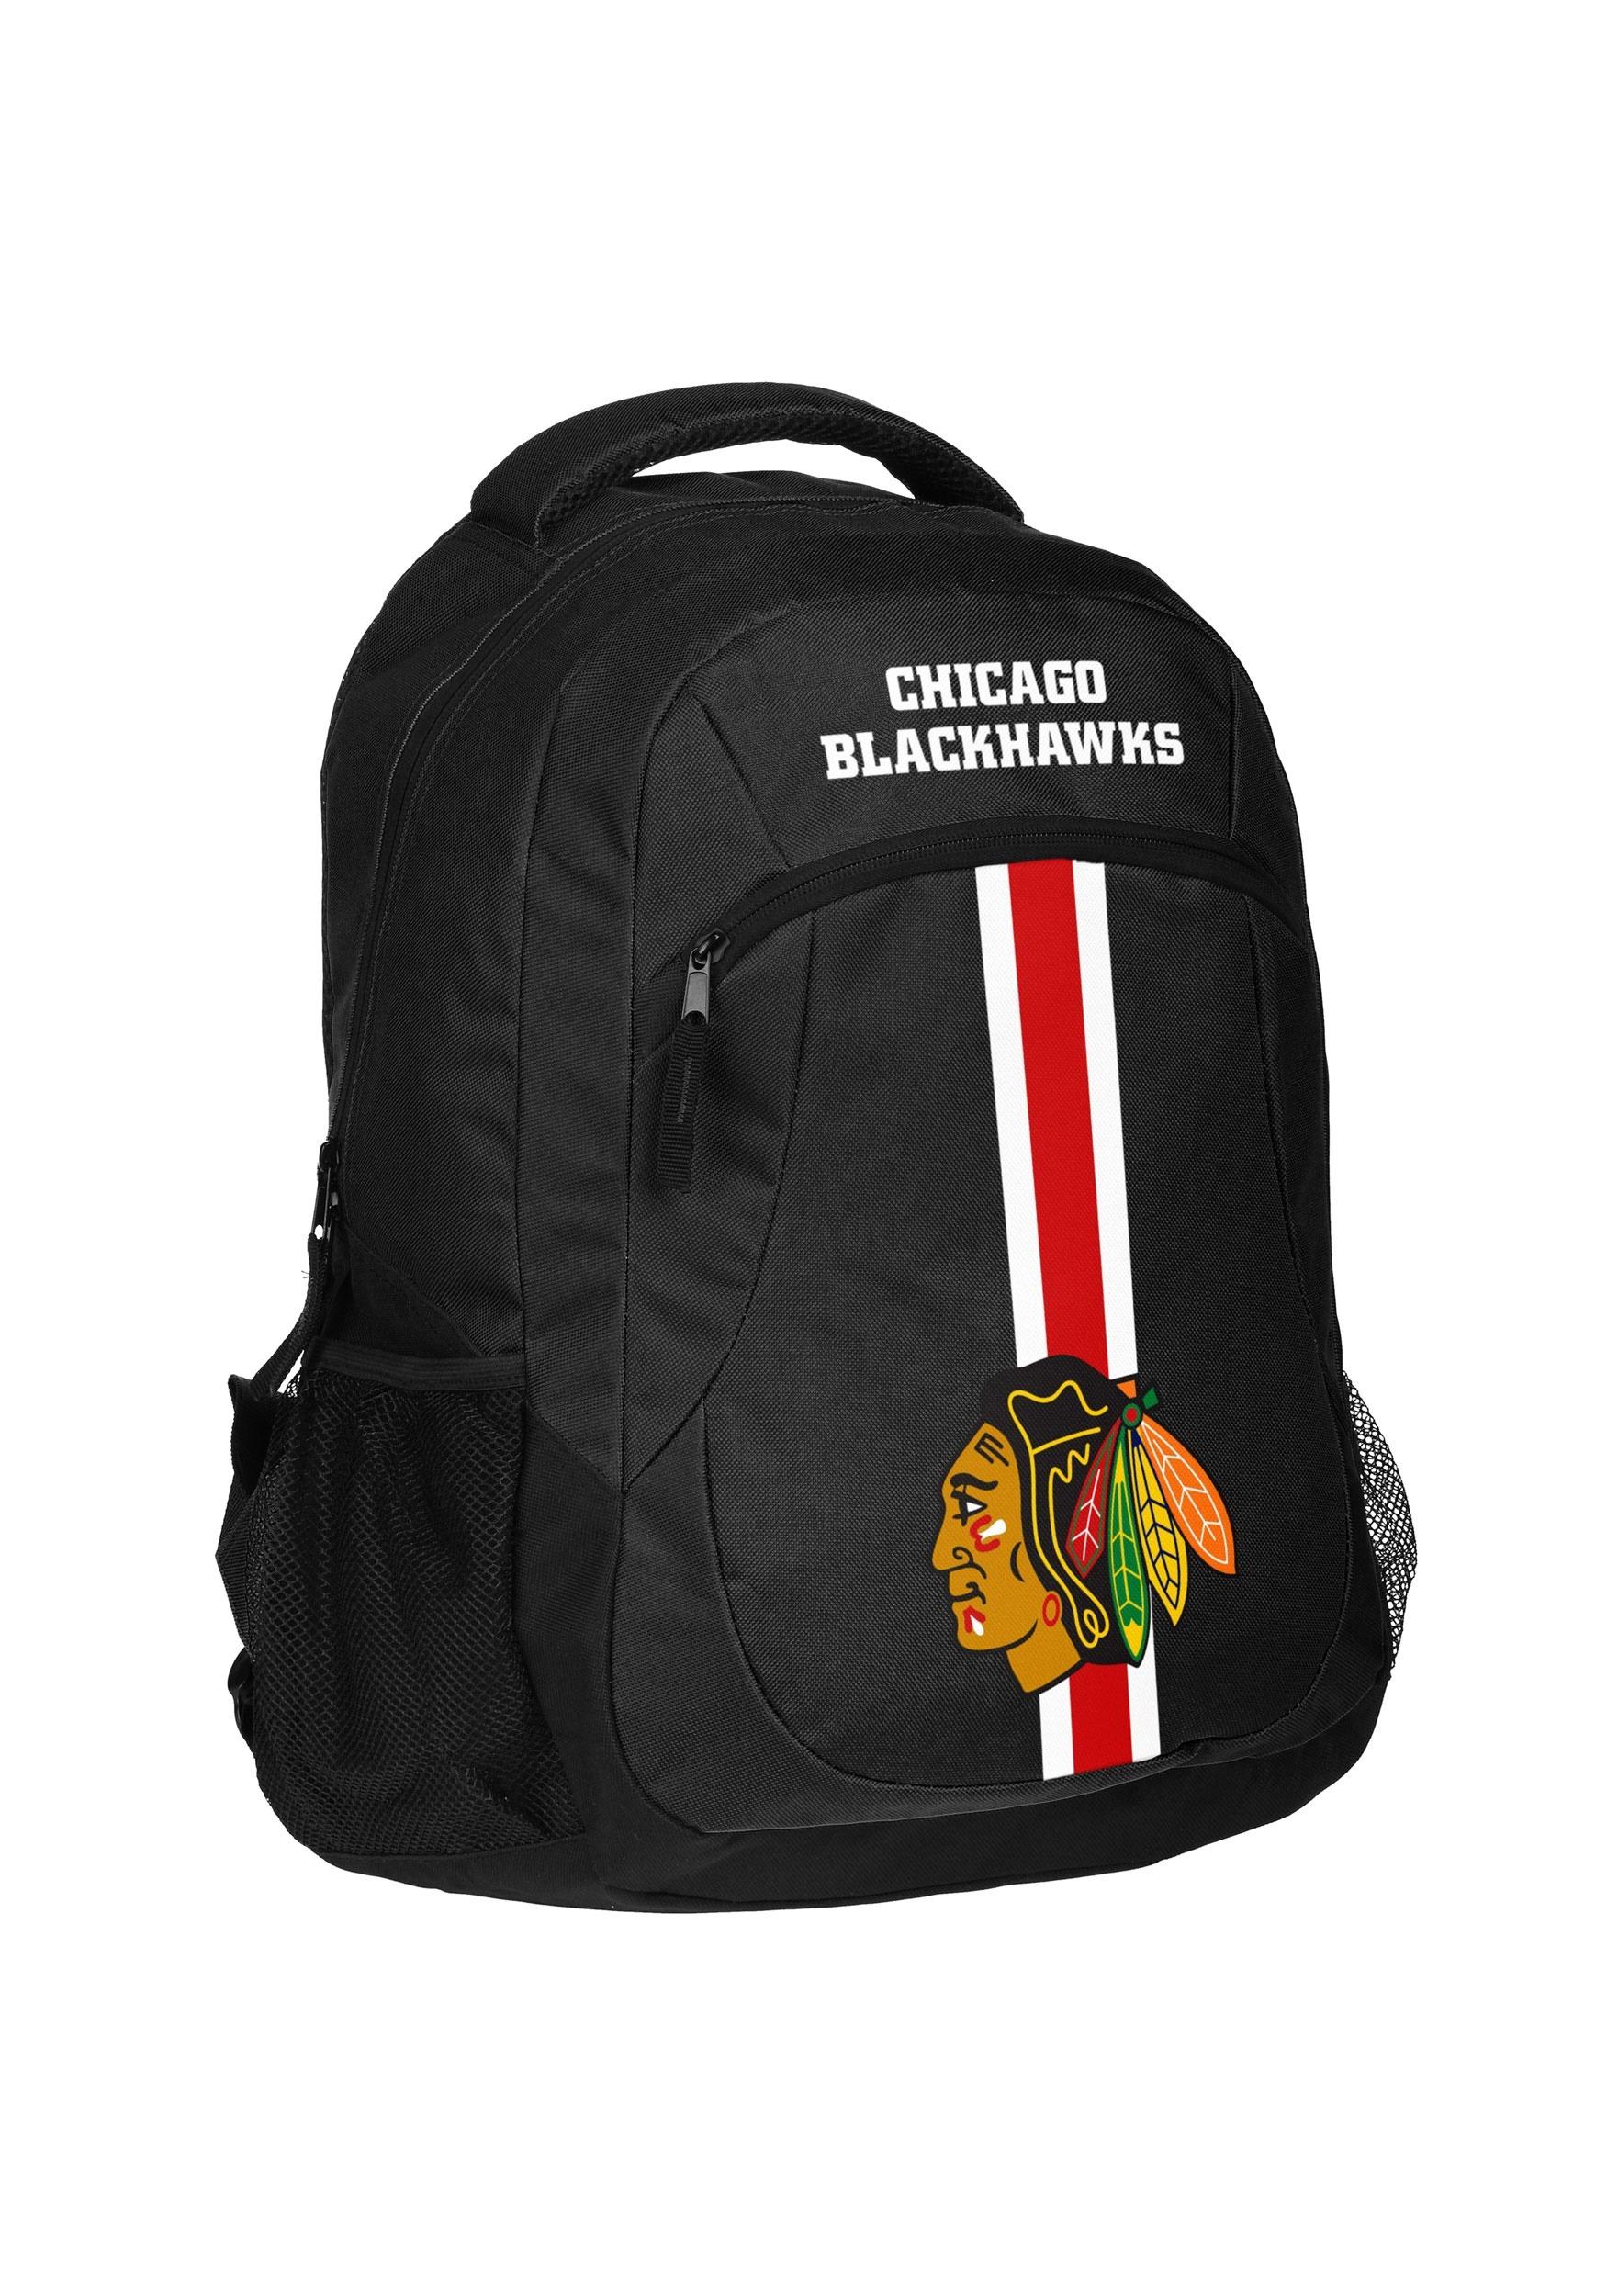 Chicago Blackhawks NHL Action Backpack